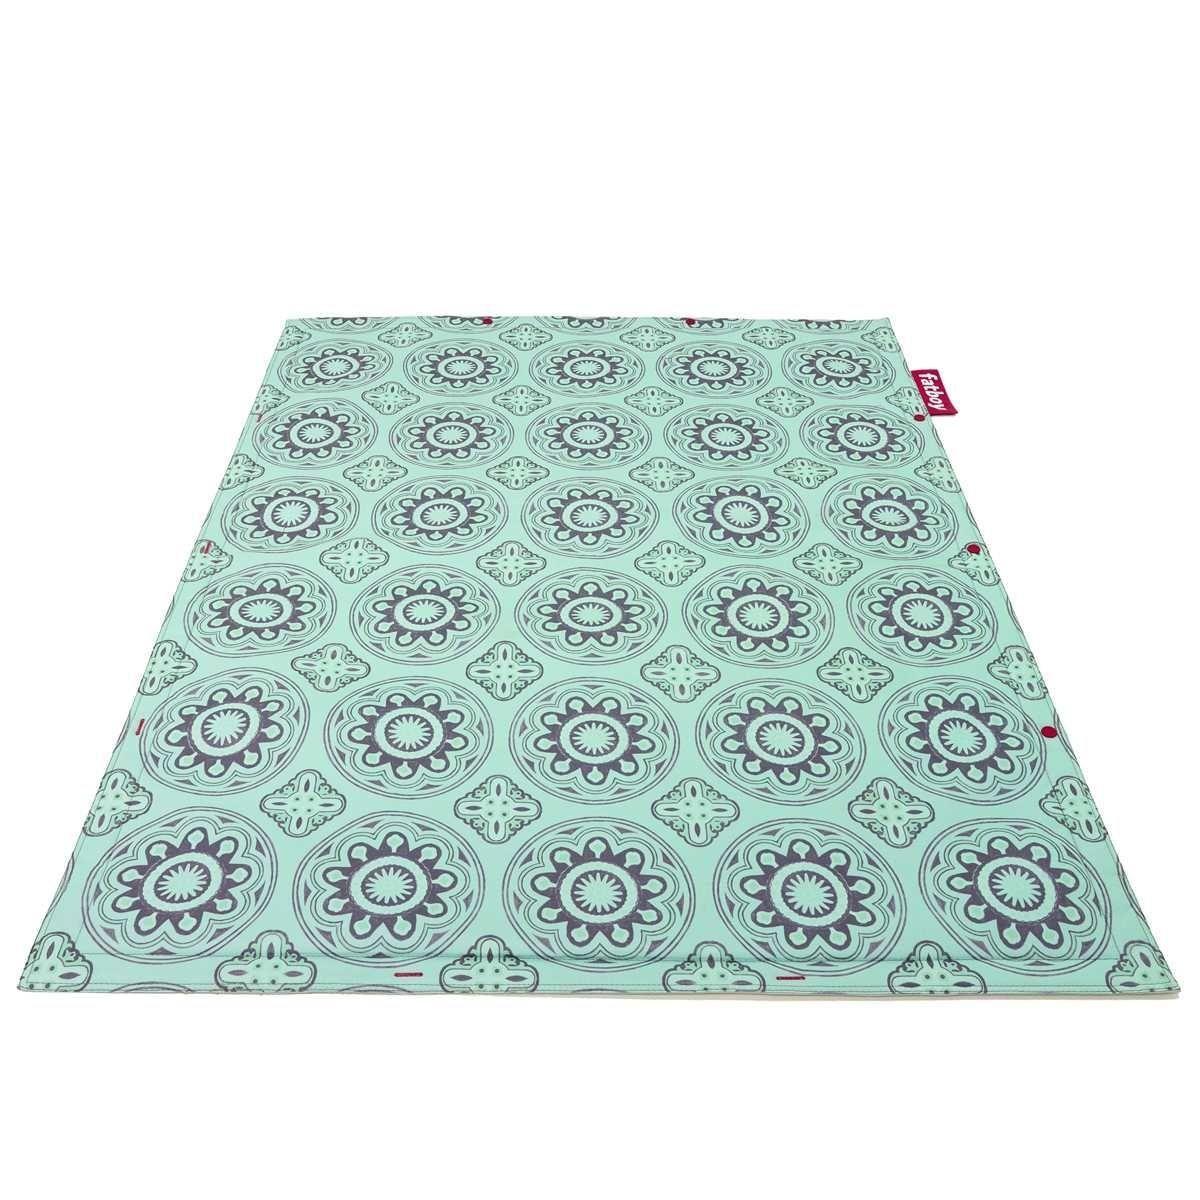 NonFlying Carpet Teppich  Fatboy  Teppiche  Textilie